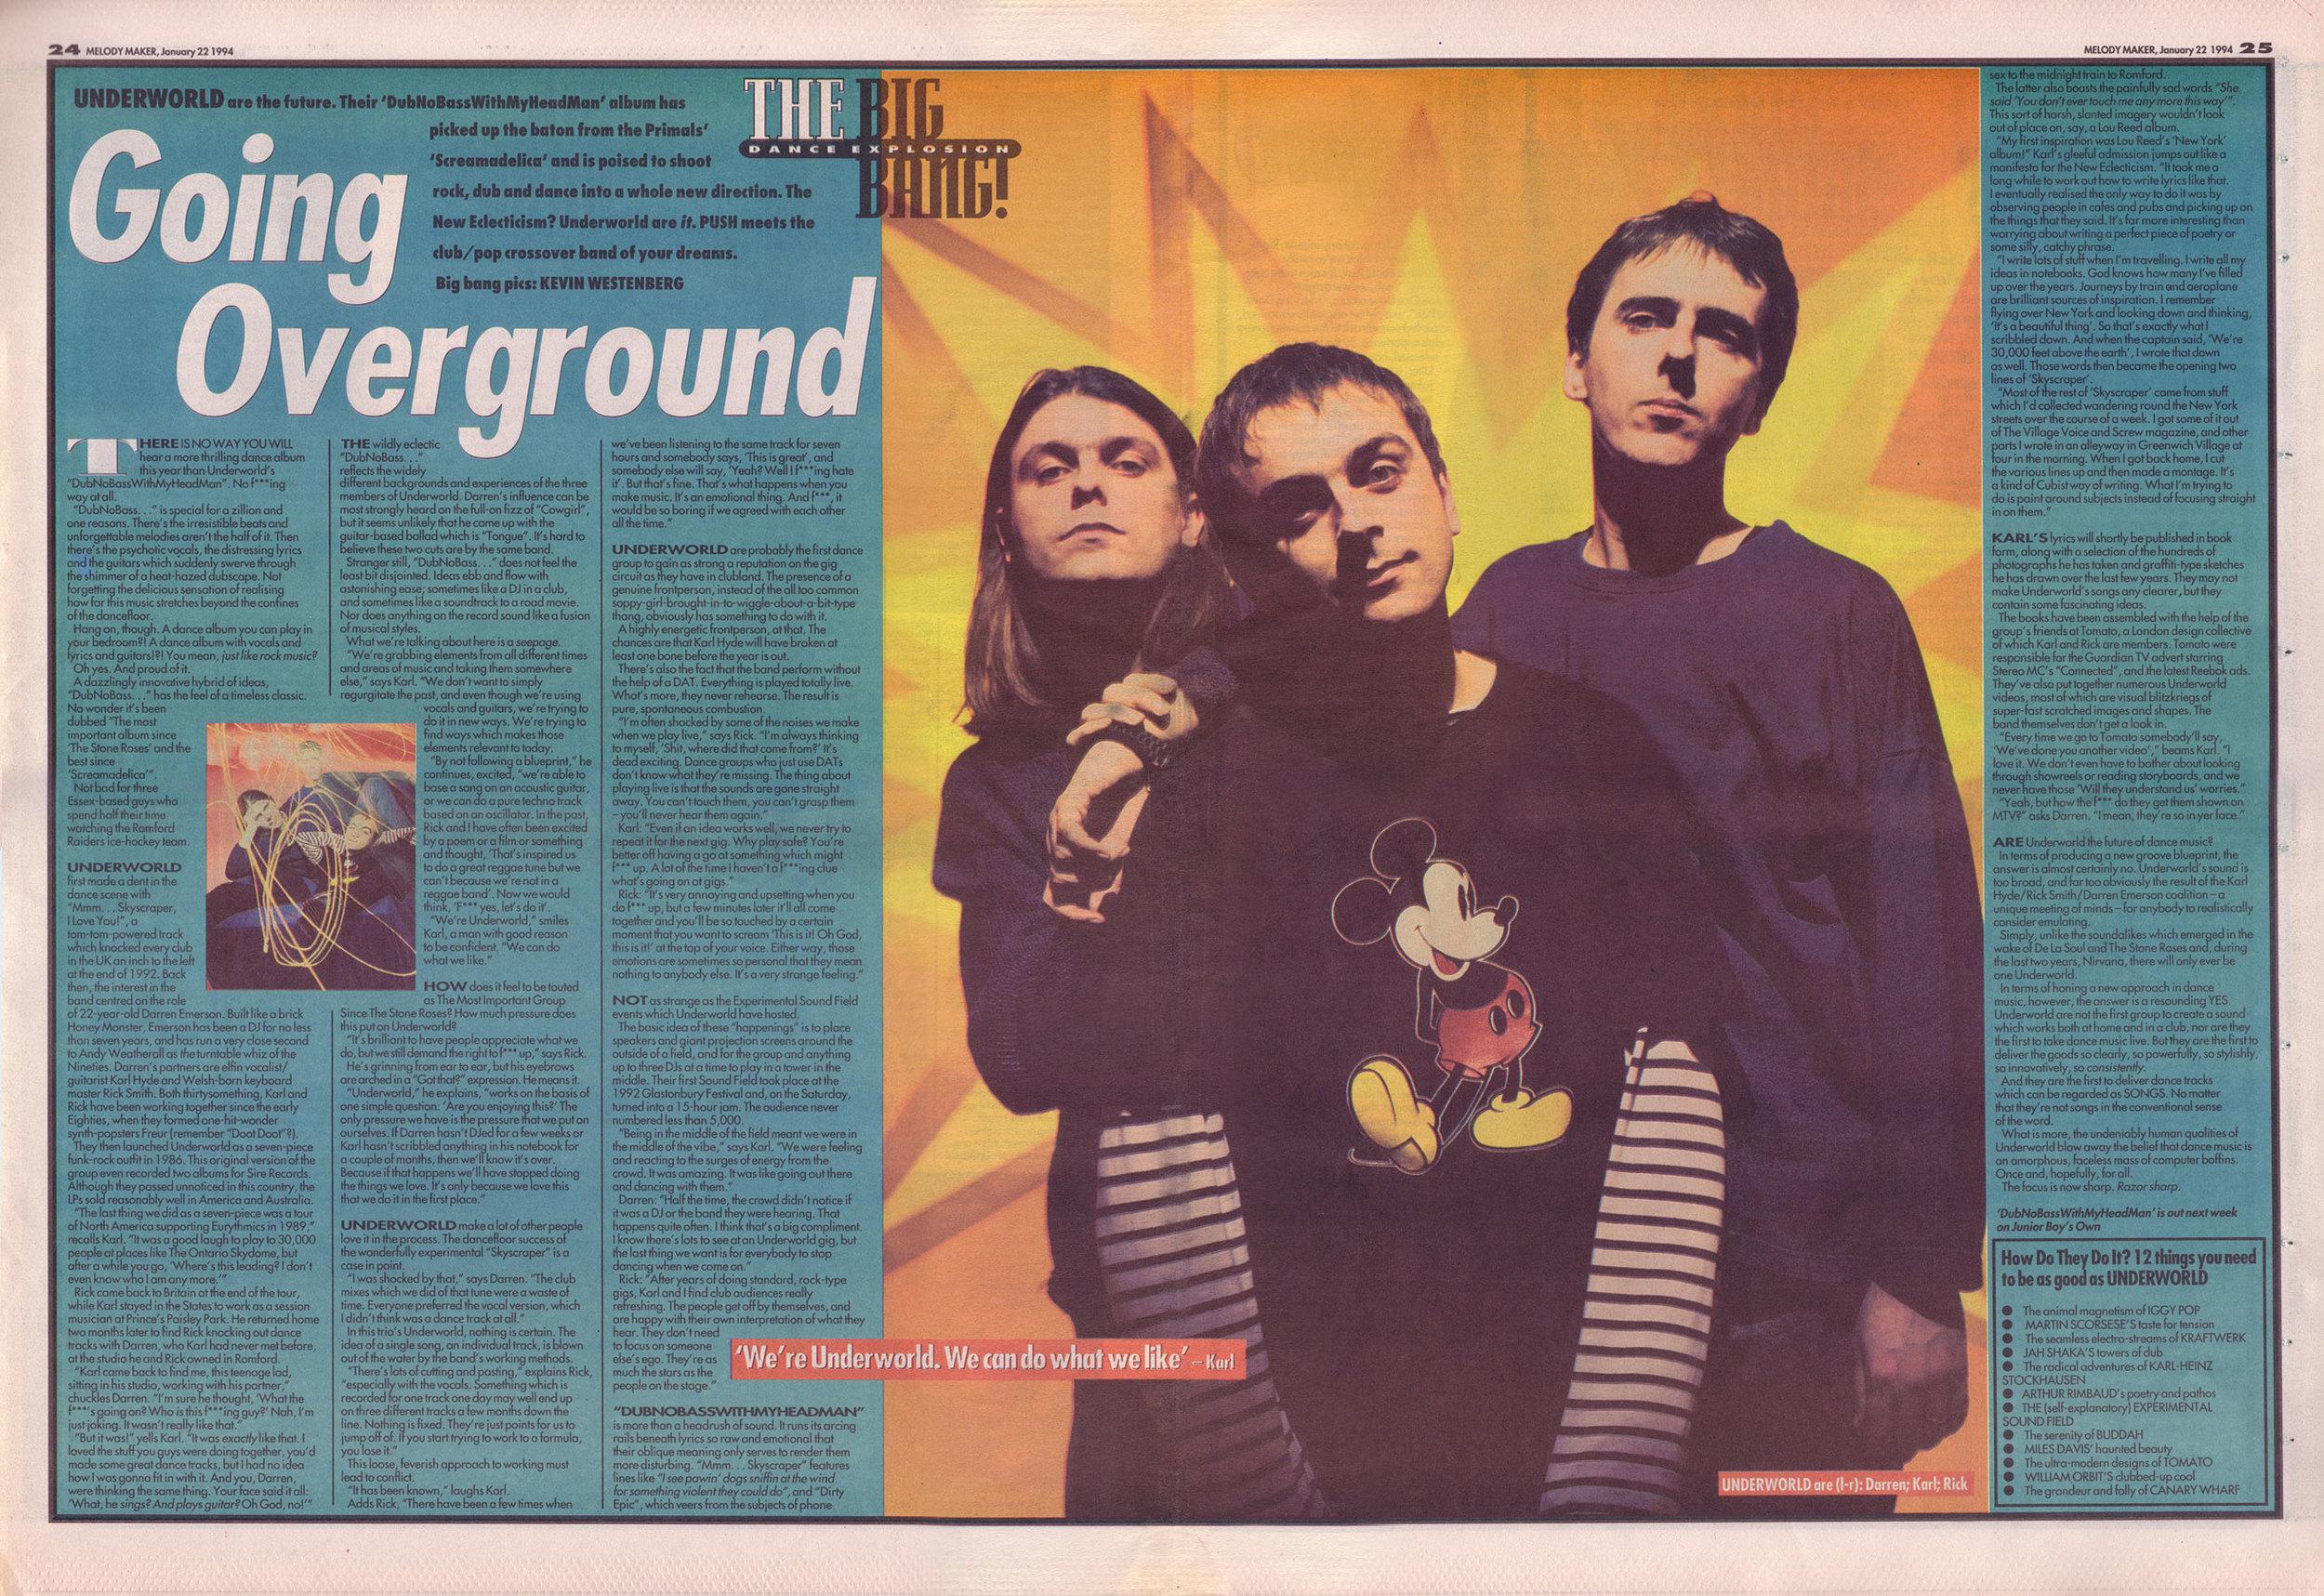 push-interviews-underworld-22nd-december-1994.jpg